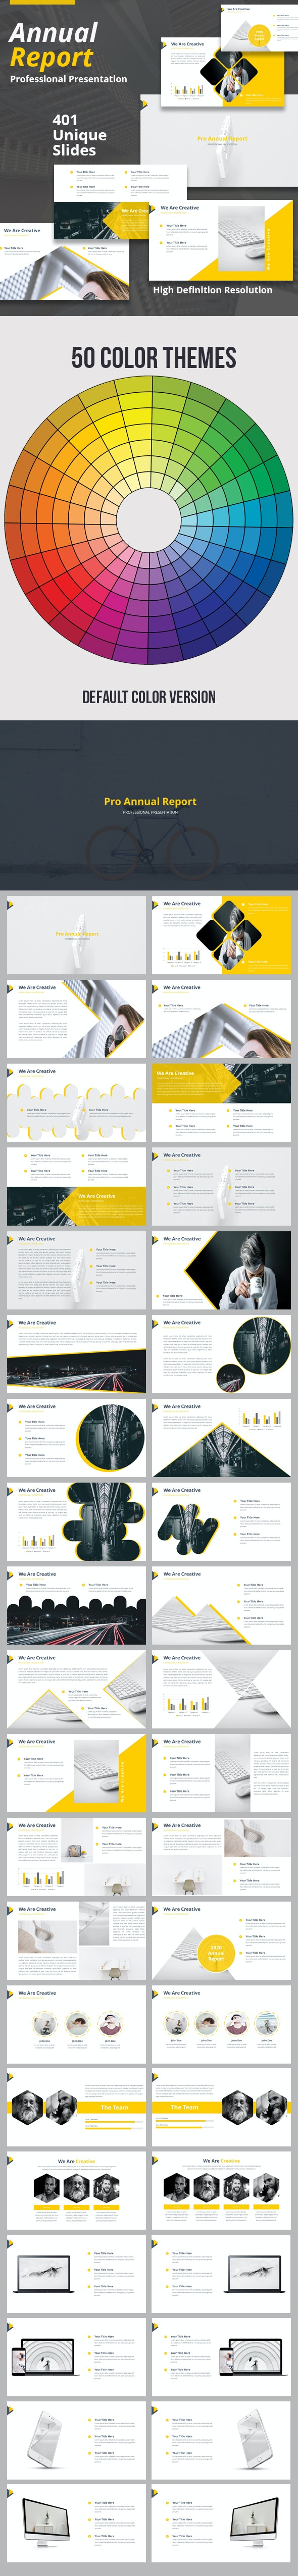 Pro Annual Report Keynote Presentation Template - Business Keynote Templates